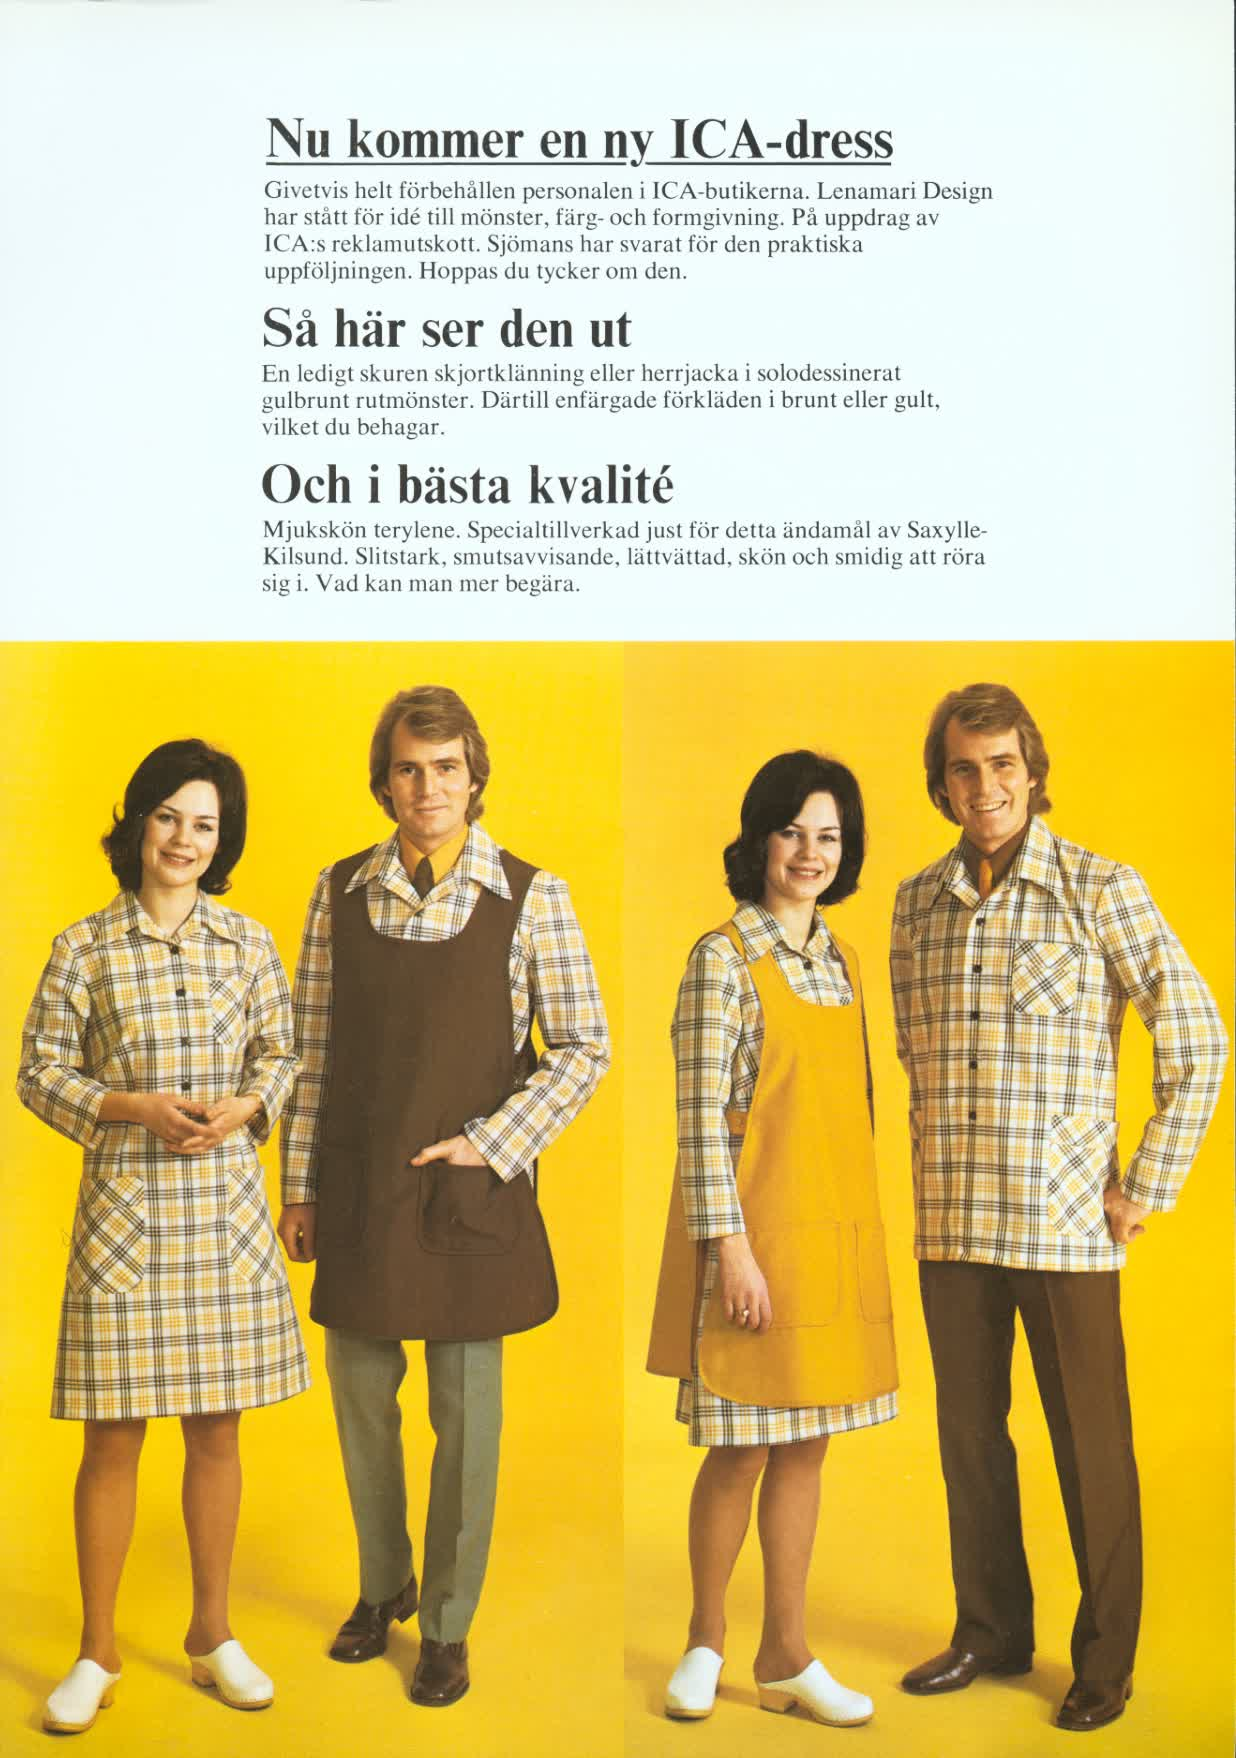 6baa68be58ca Biträdets nya kläder - ICA-historien